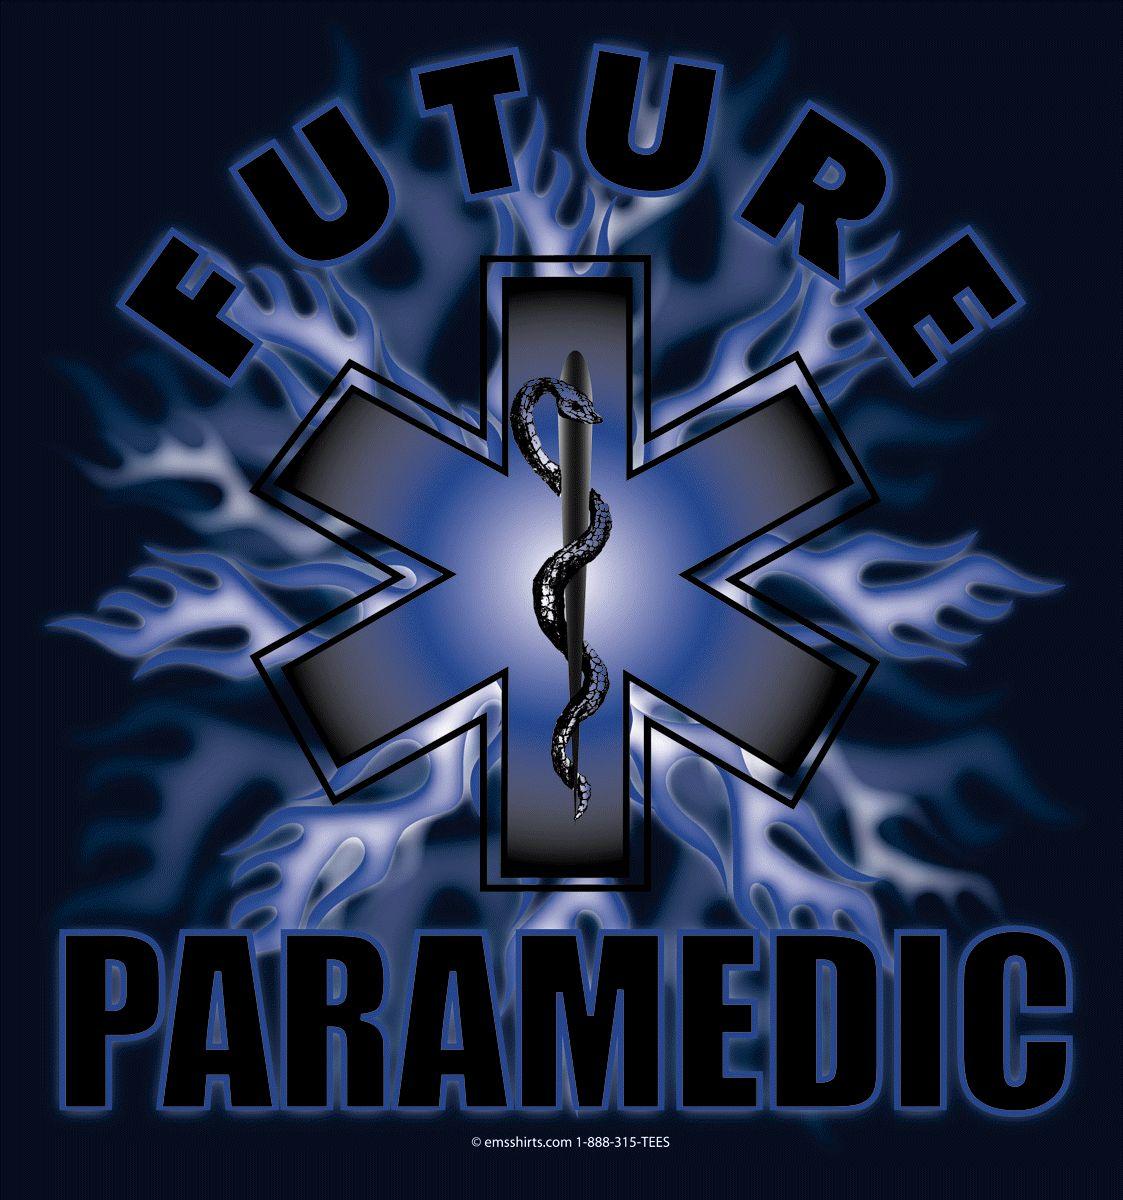 Pin By Leah Burton On Wallpaper Paramedic Paramedic Humor Emt Paramedic